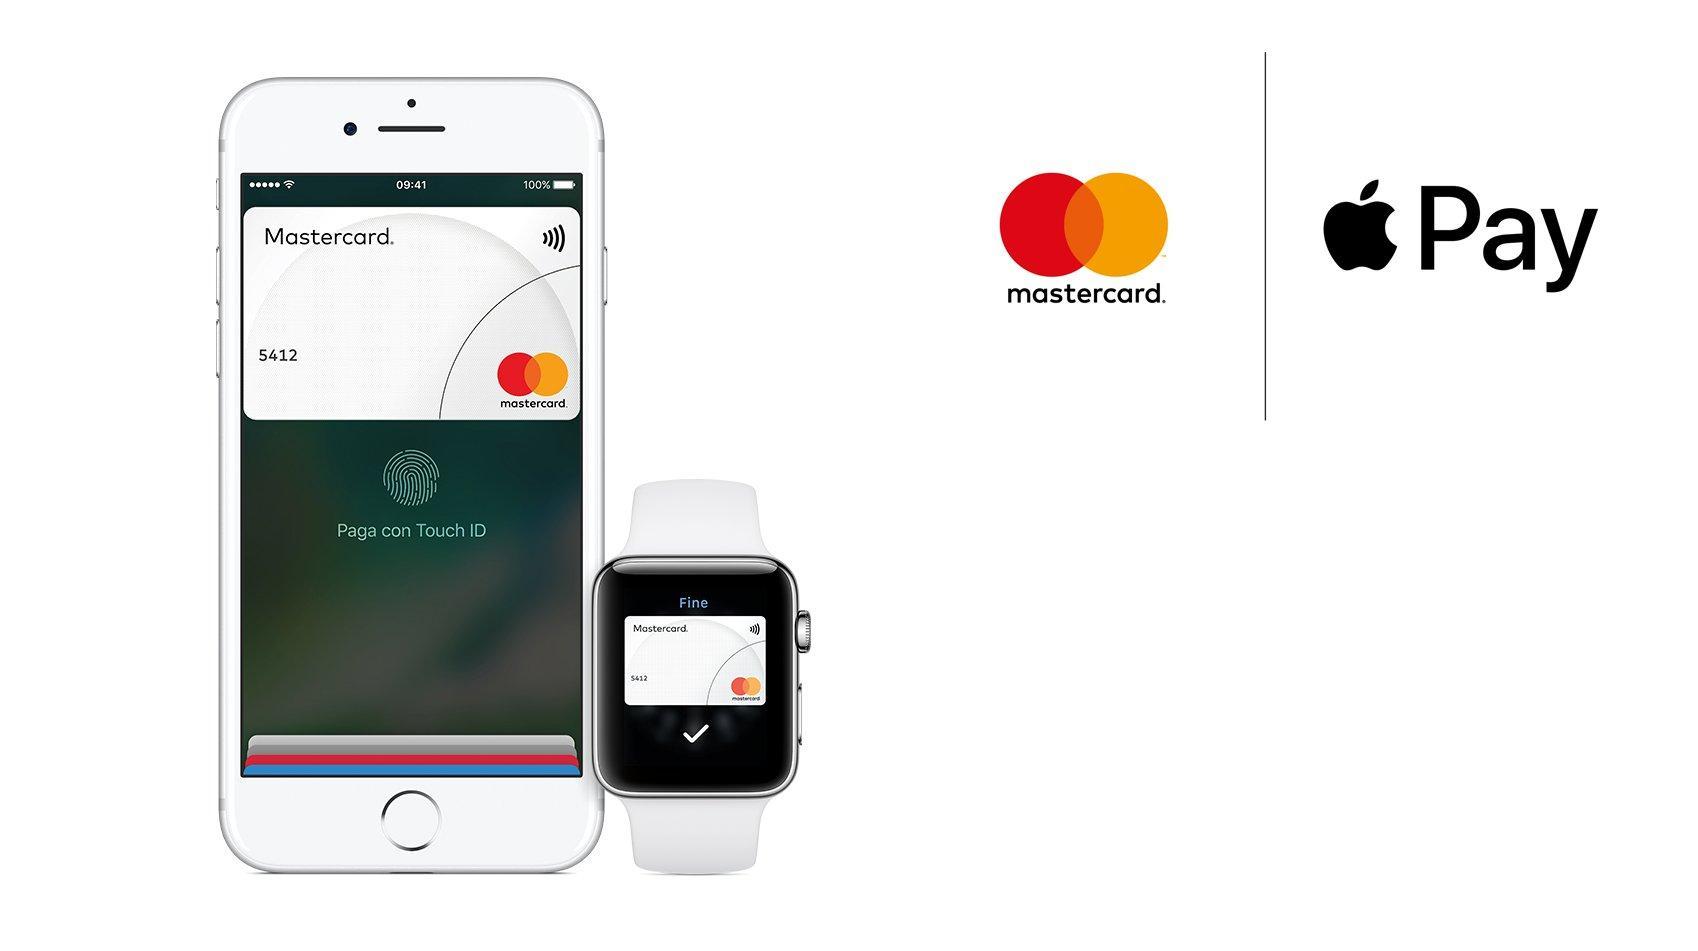 Apple Pay arriva oggi in Italia per i clienti Mastercard